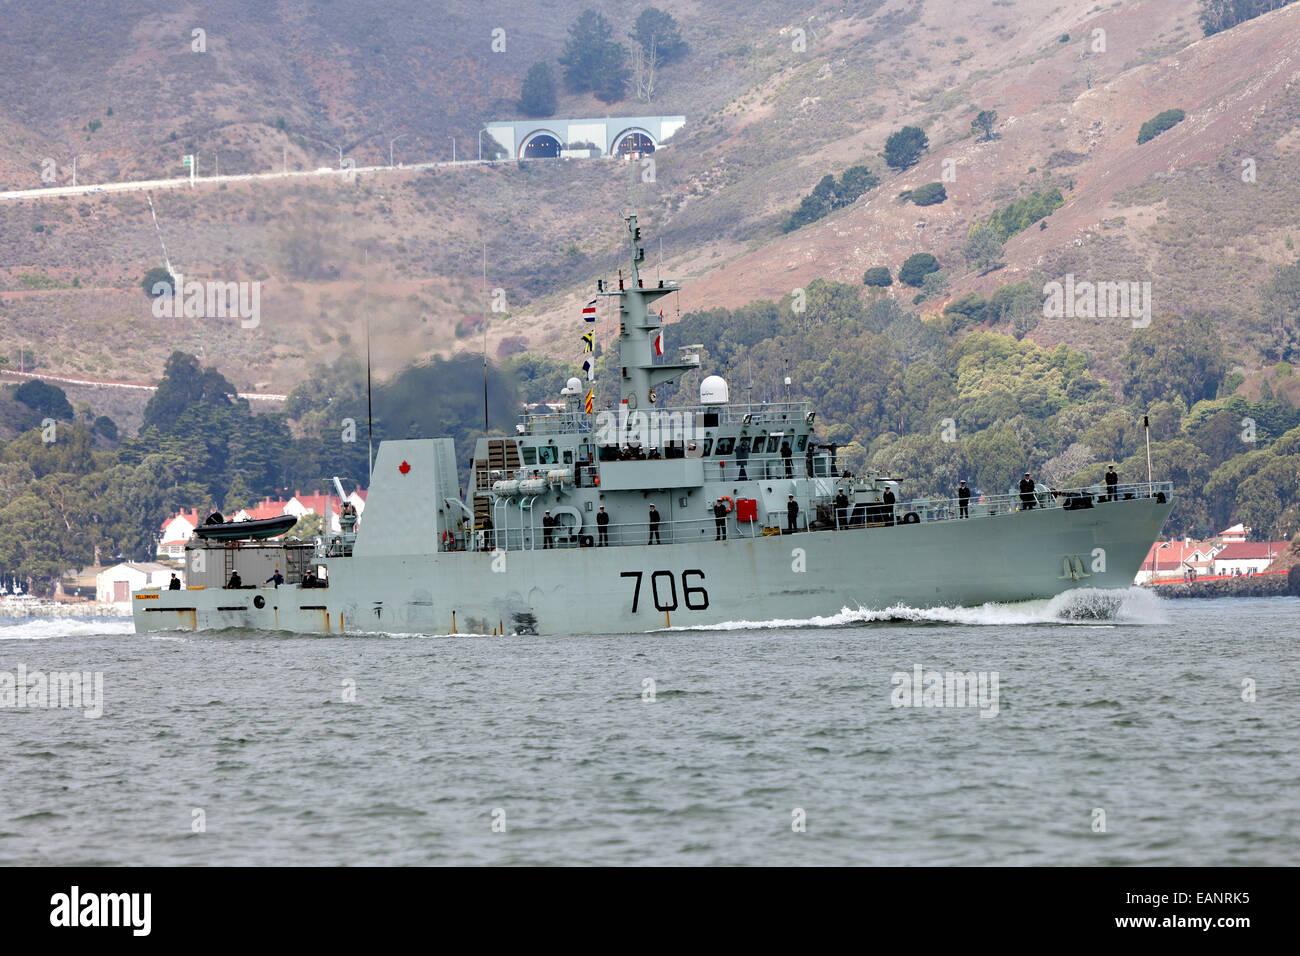 Canadian Navy Kingston class patrol vessel HMCS Yellowknife (MM 706) enters San Francisco Bay in October 2014. - Stock Image